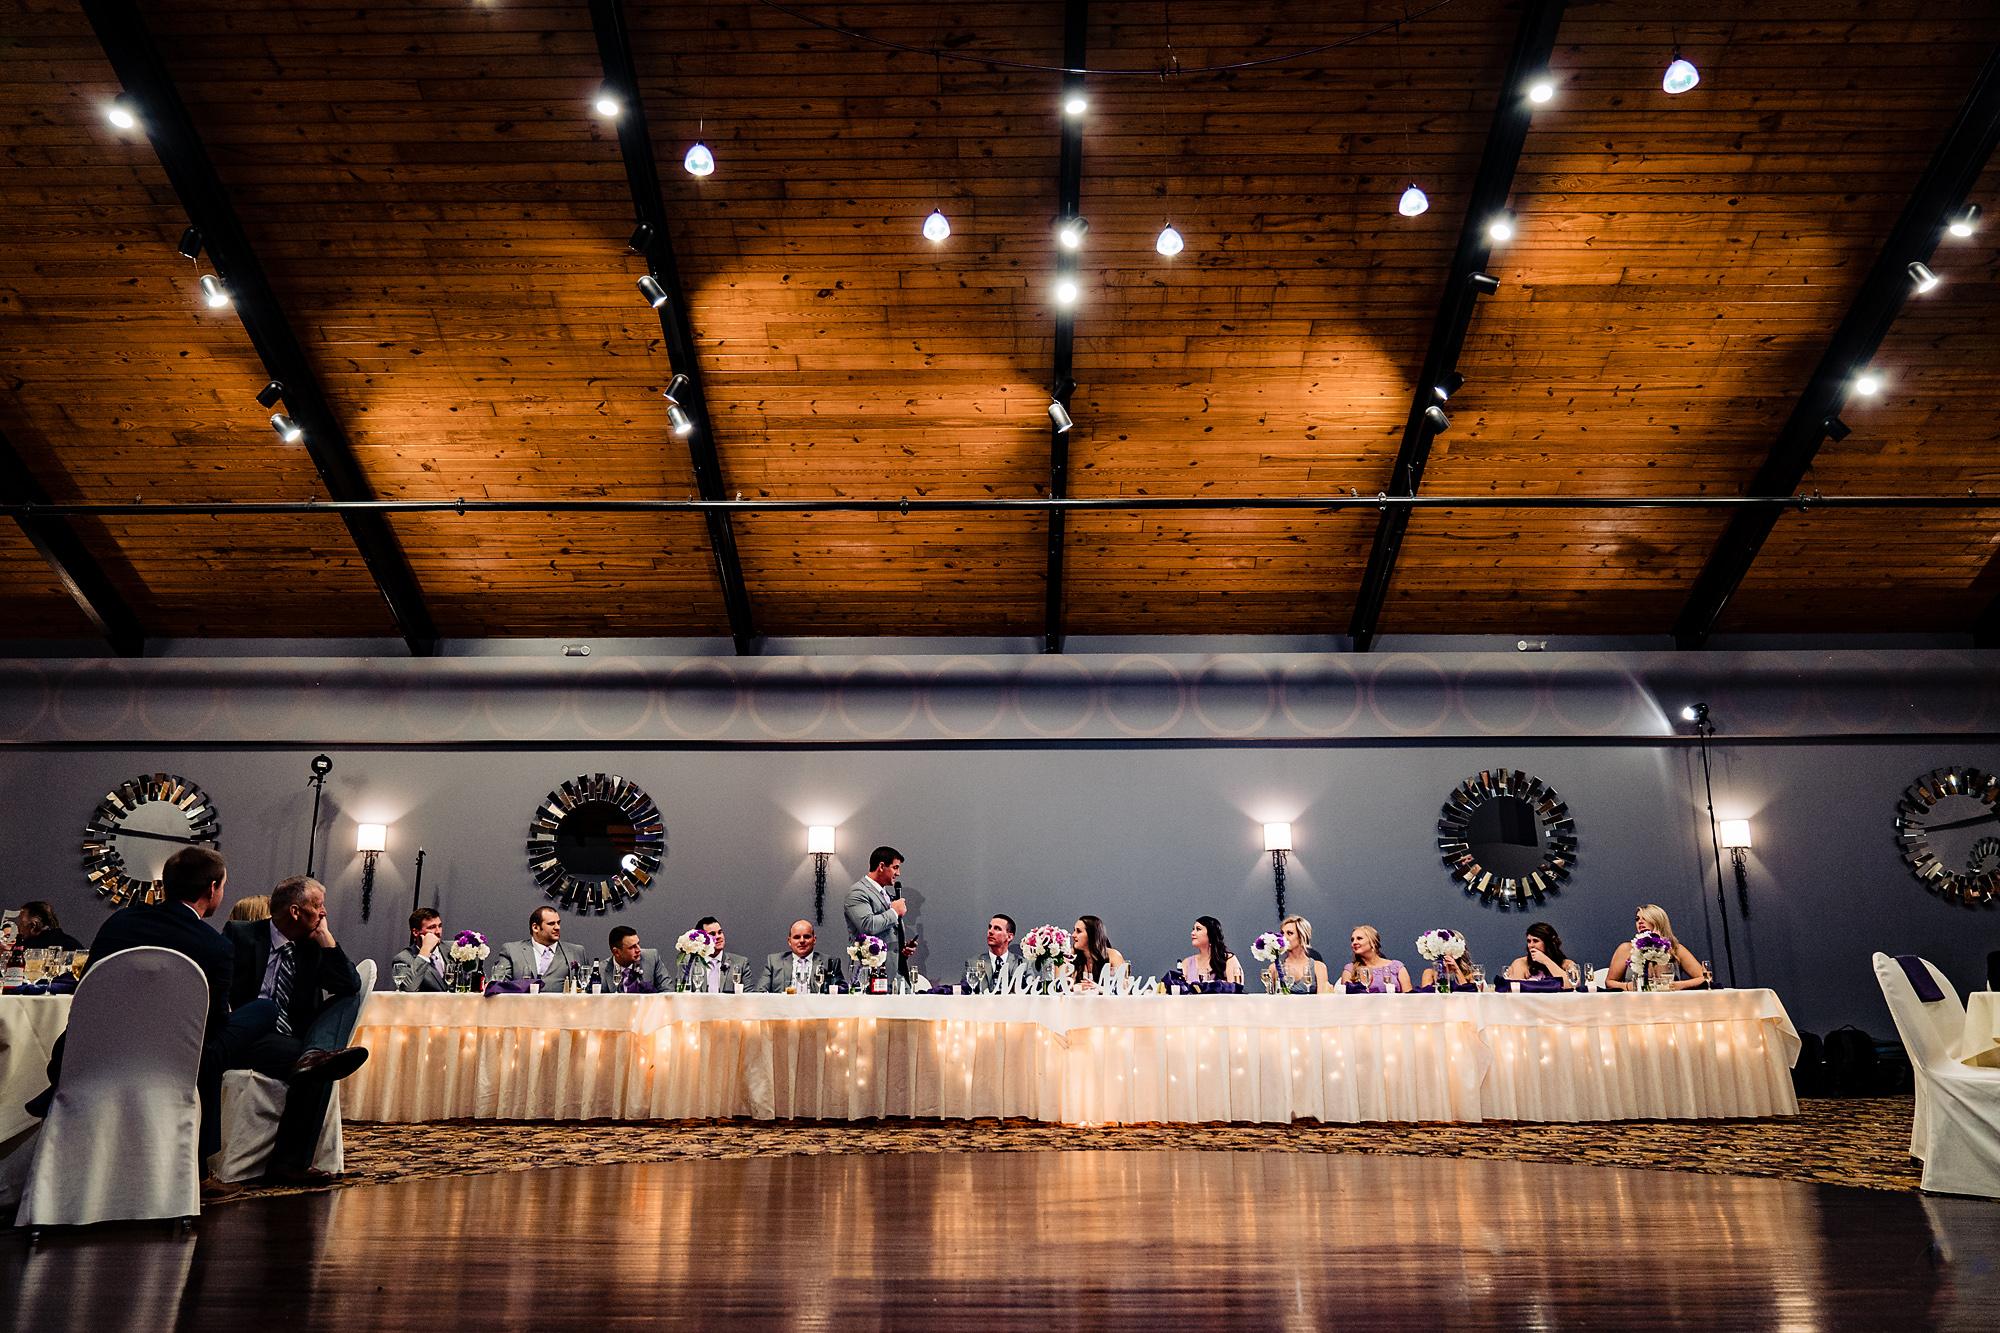 The-Pinnacle-Ballroom-Covington-KY-Wedding-Photography-15.jpg